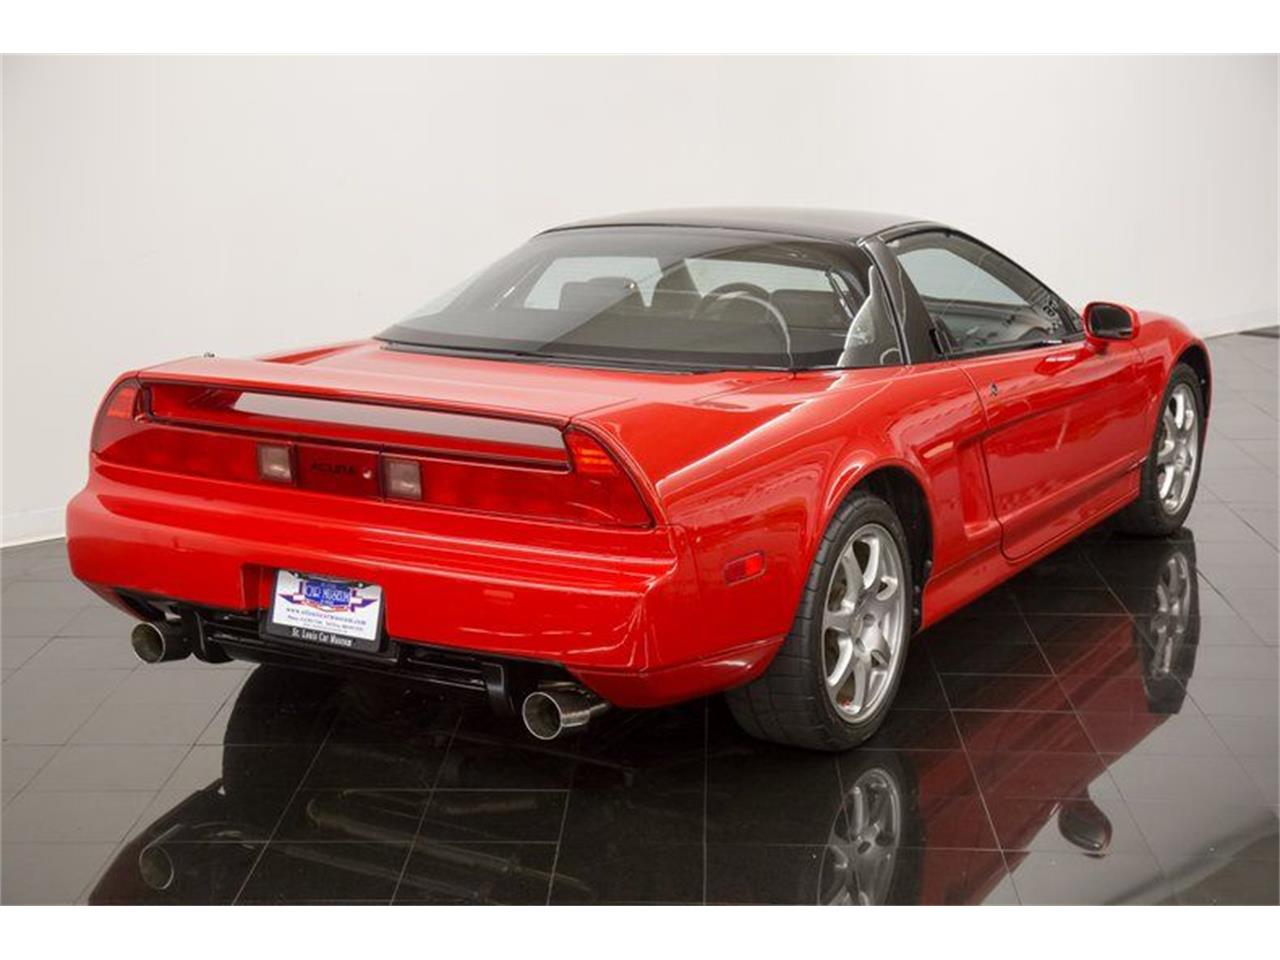 Acura Dealers St Louis >> 1994 Acura NSX for Sale | ClassicCars.com | CC-1247275